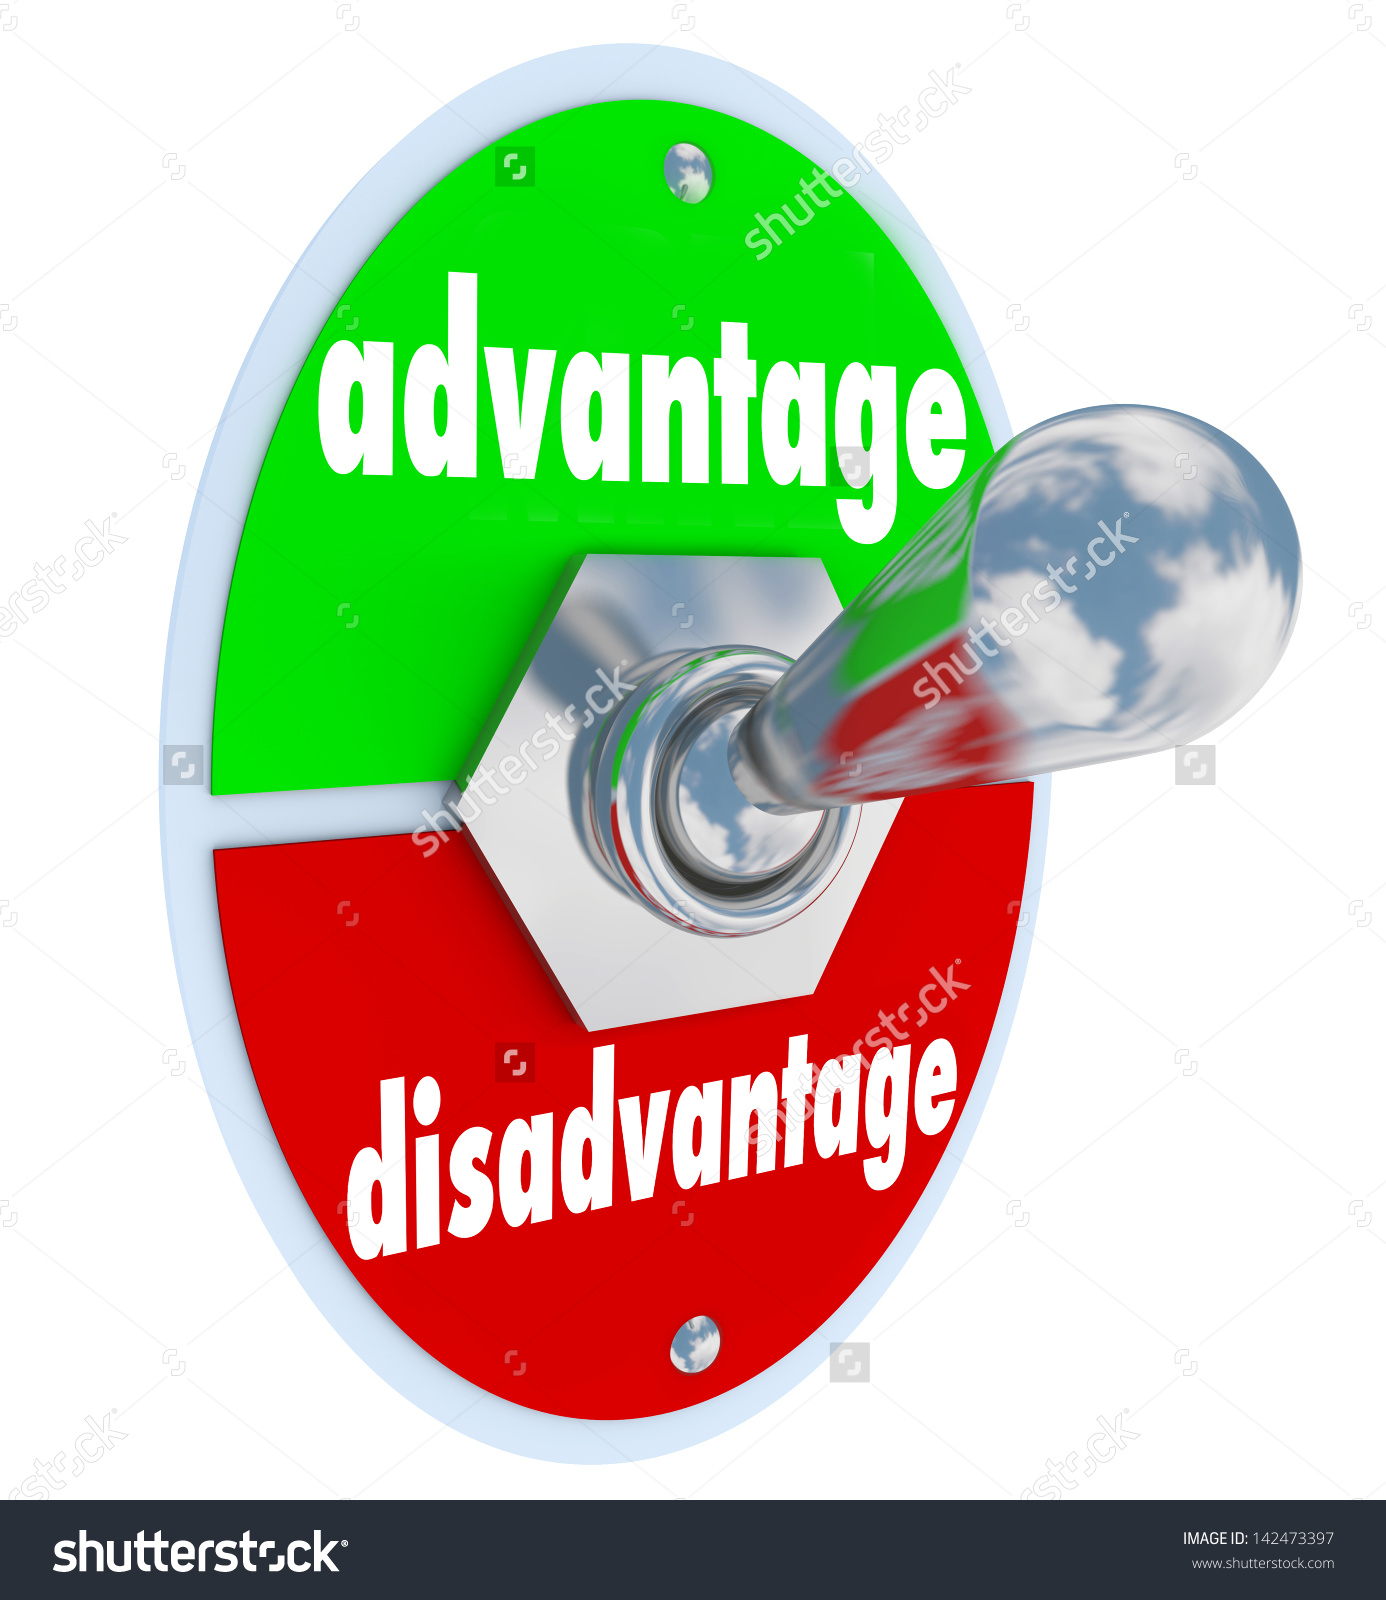 Advantages and Disadvantages Clip Art.